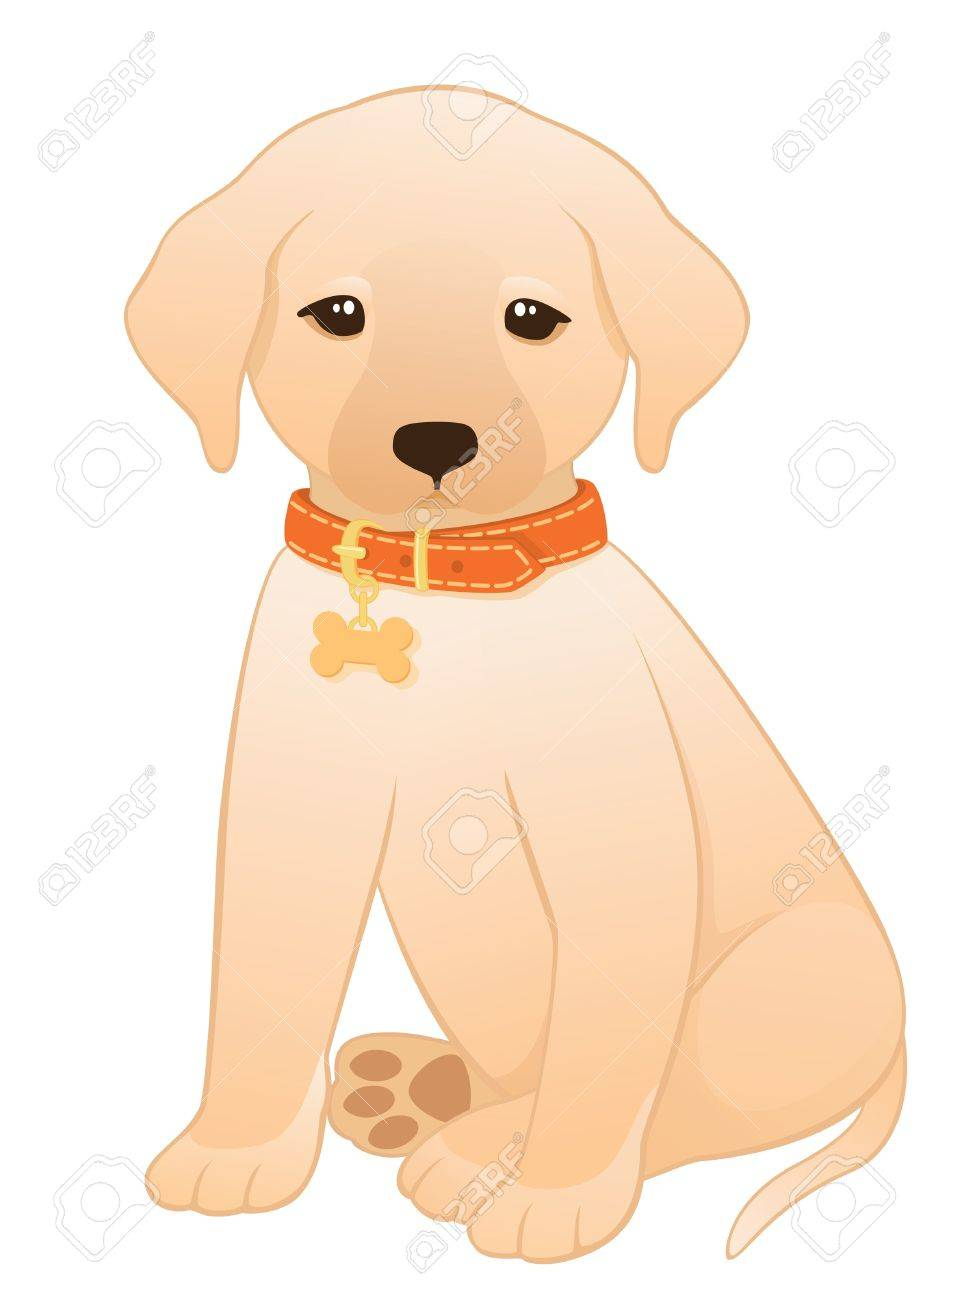 Vector illustration of a little labrador retriever puppy wearing an orange collar with a dog tag. Stock Vector - 9642443